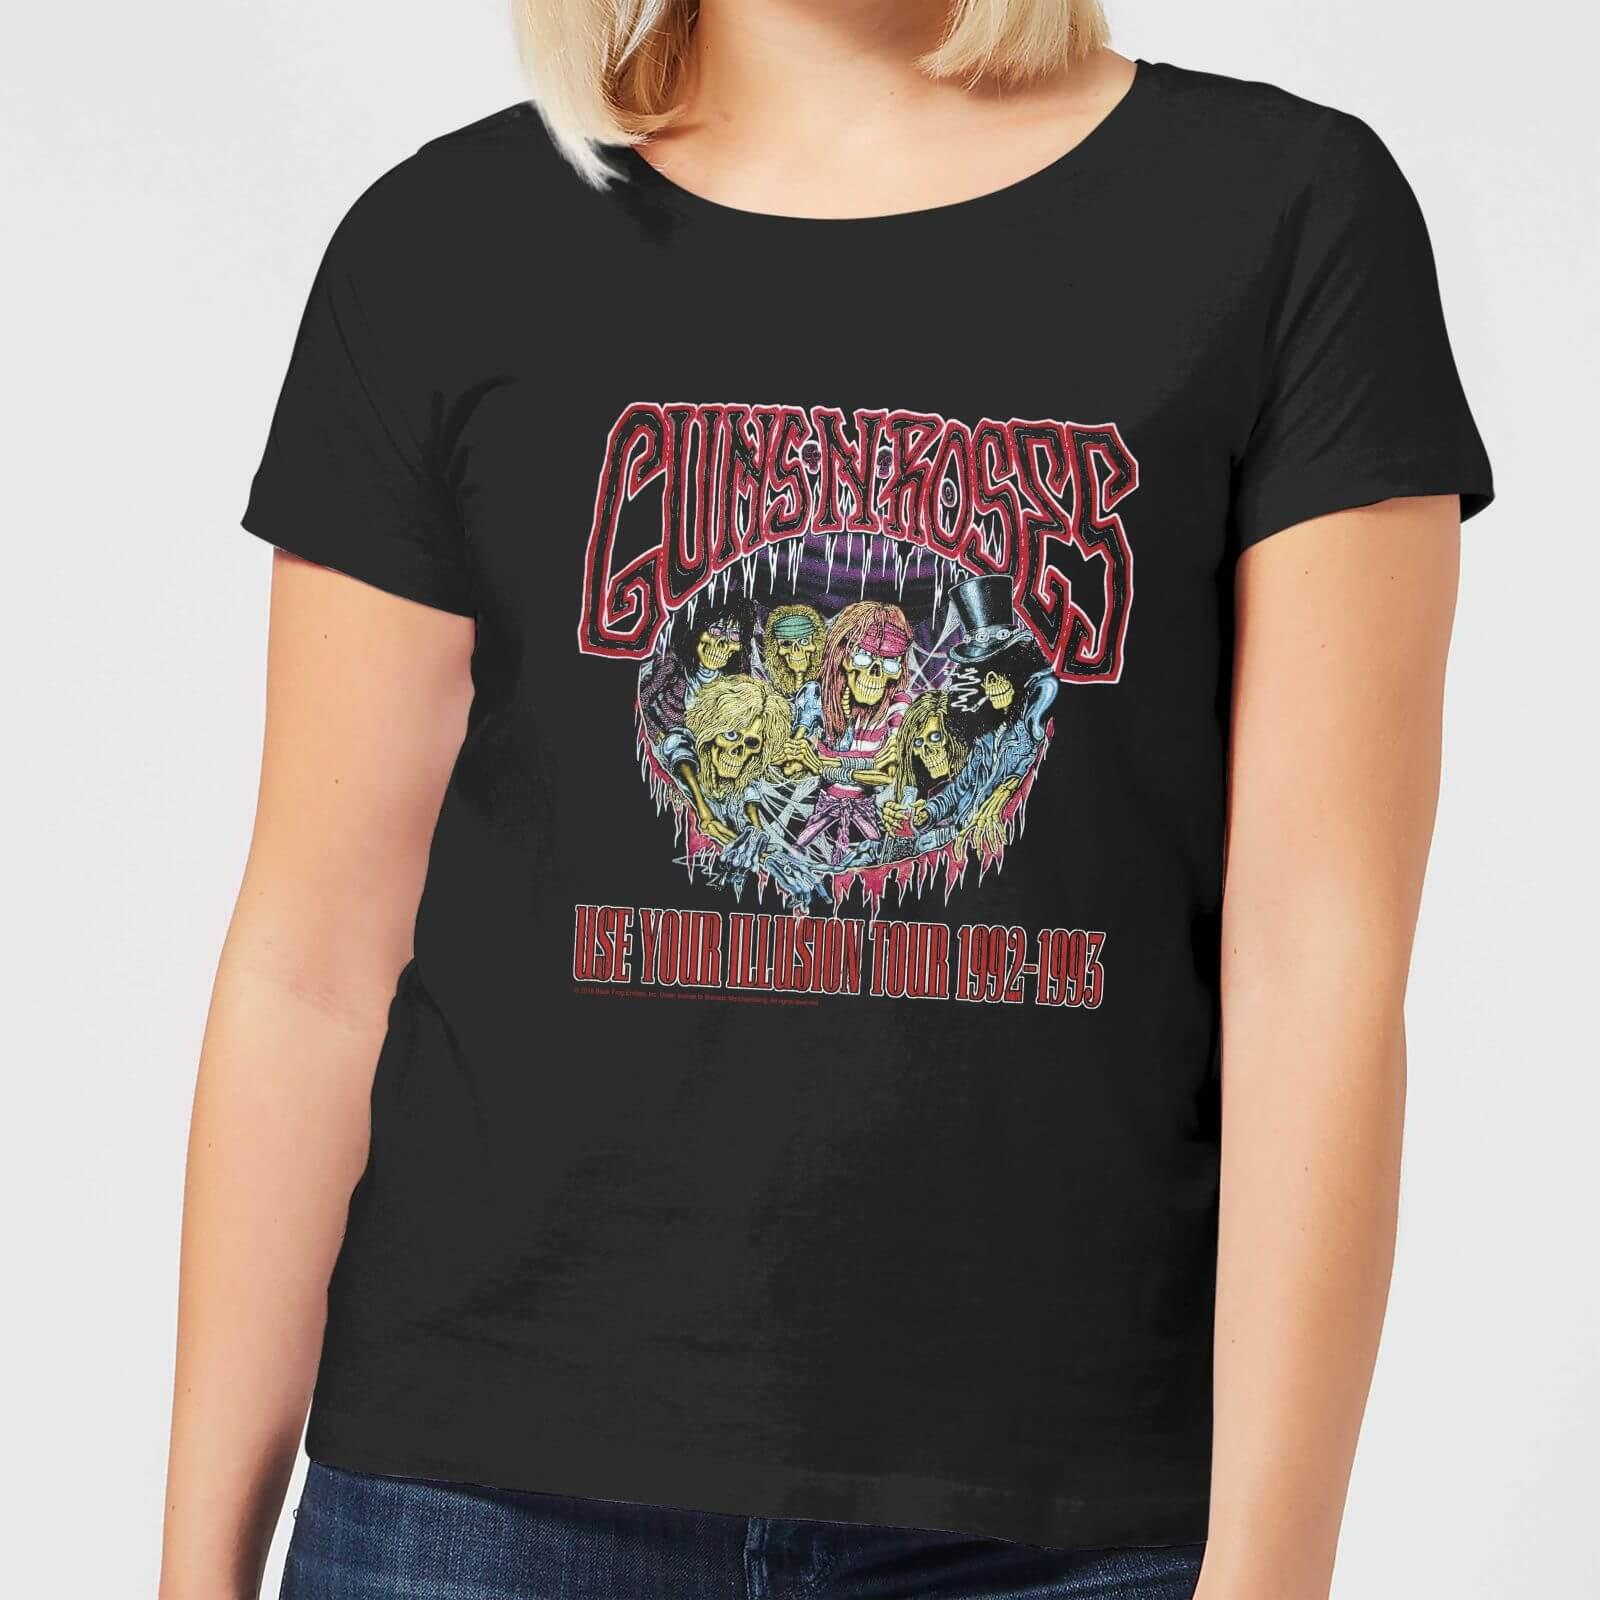 b152dd3cce0 Guns N Roses Illusion Tour T-shirt in Black - Lyst